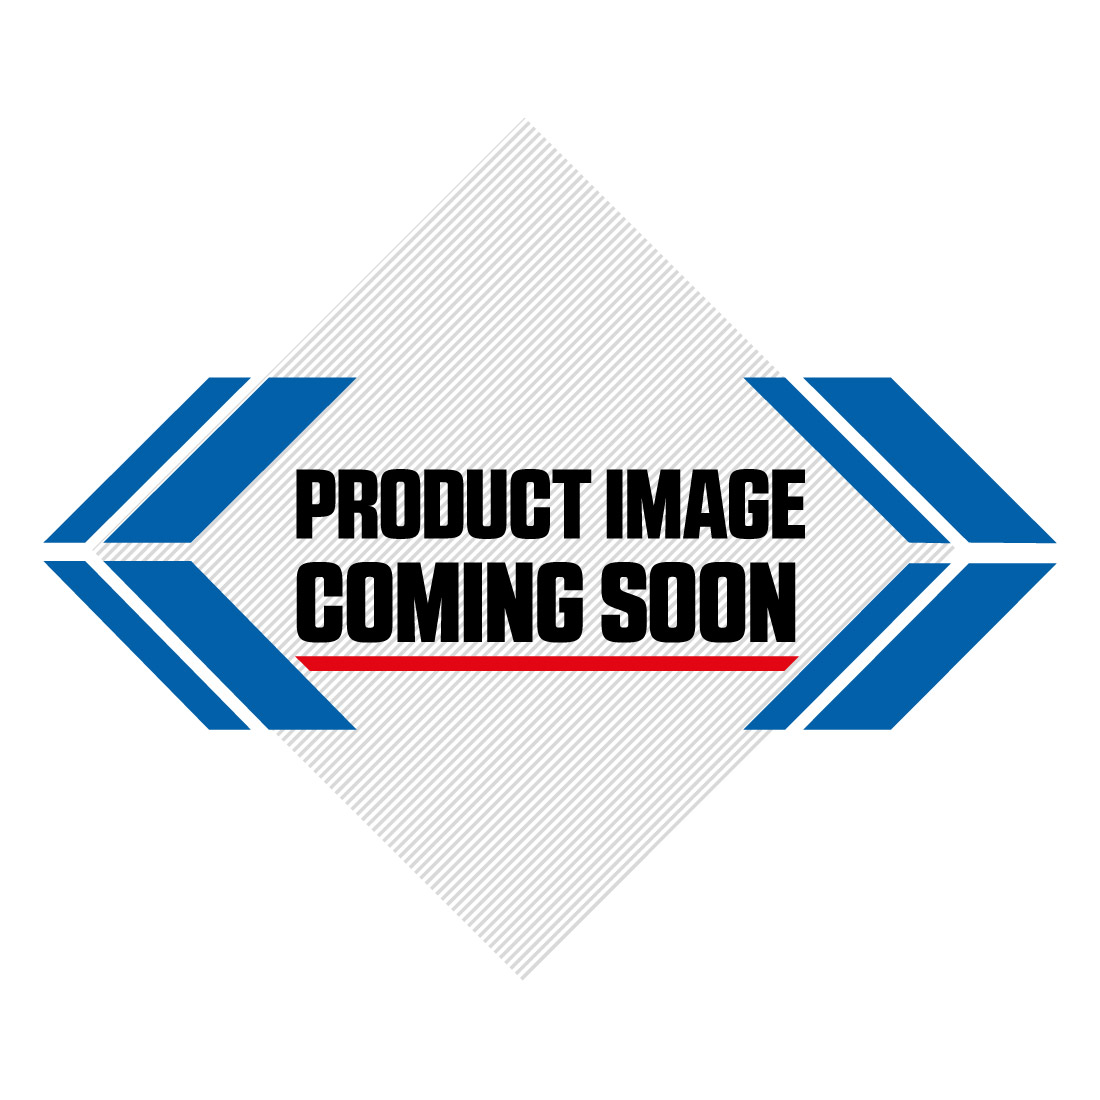 DJI Goggles - Immersive FPV Goggles Image-2>